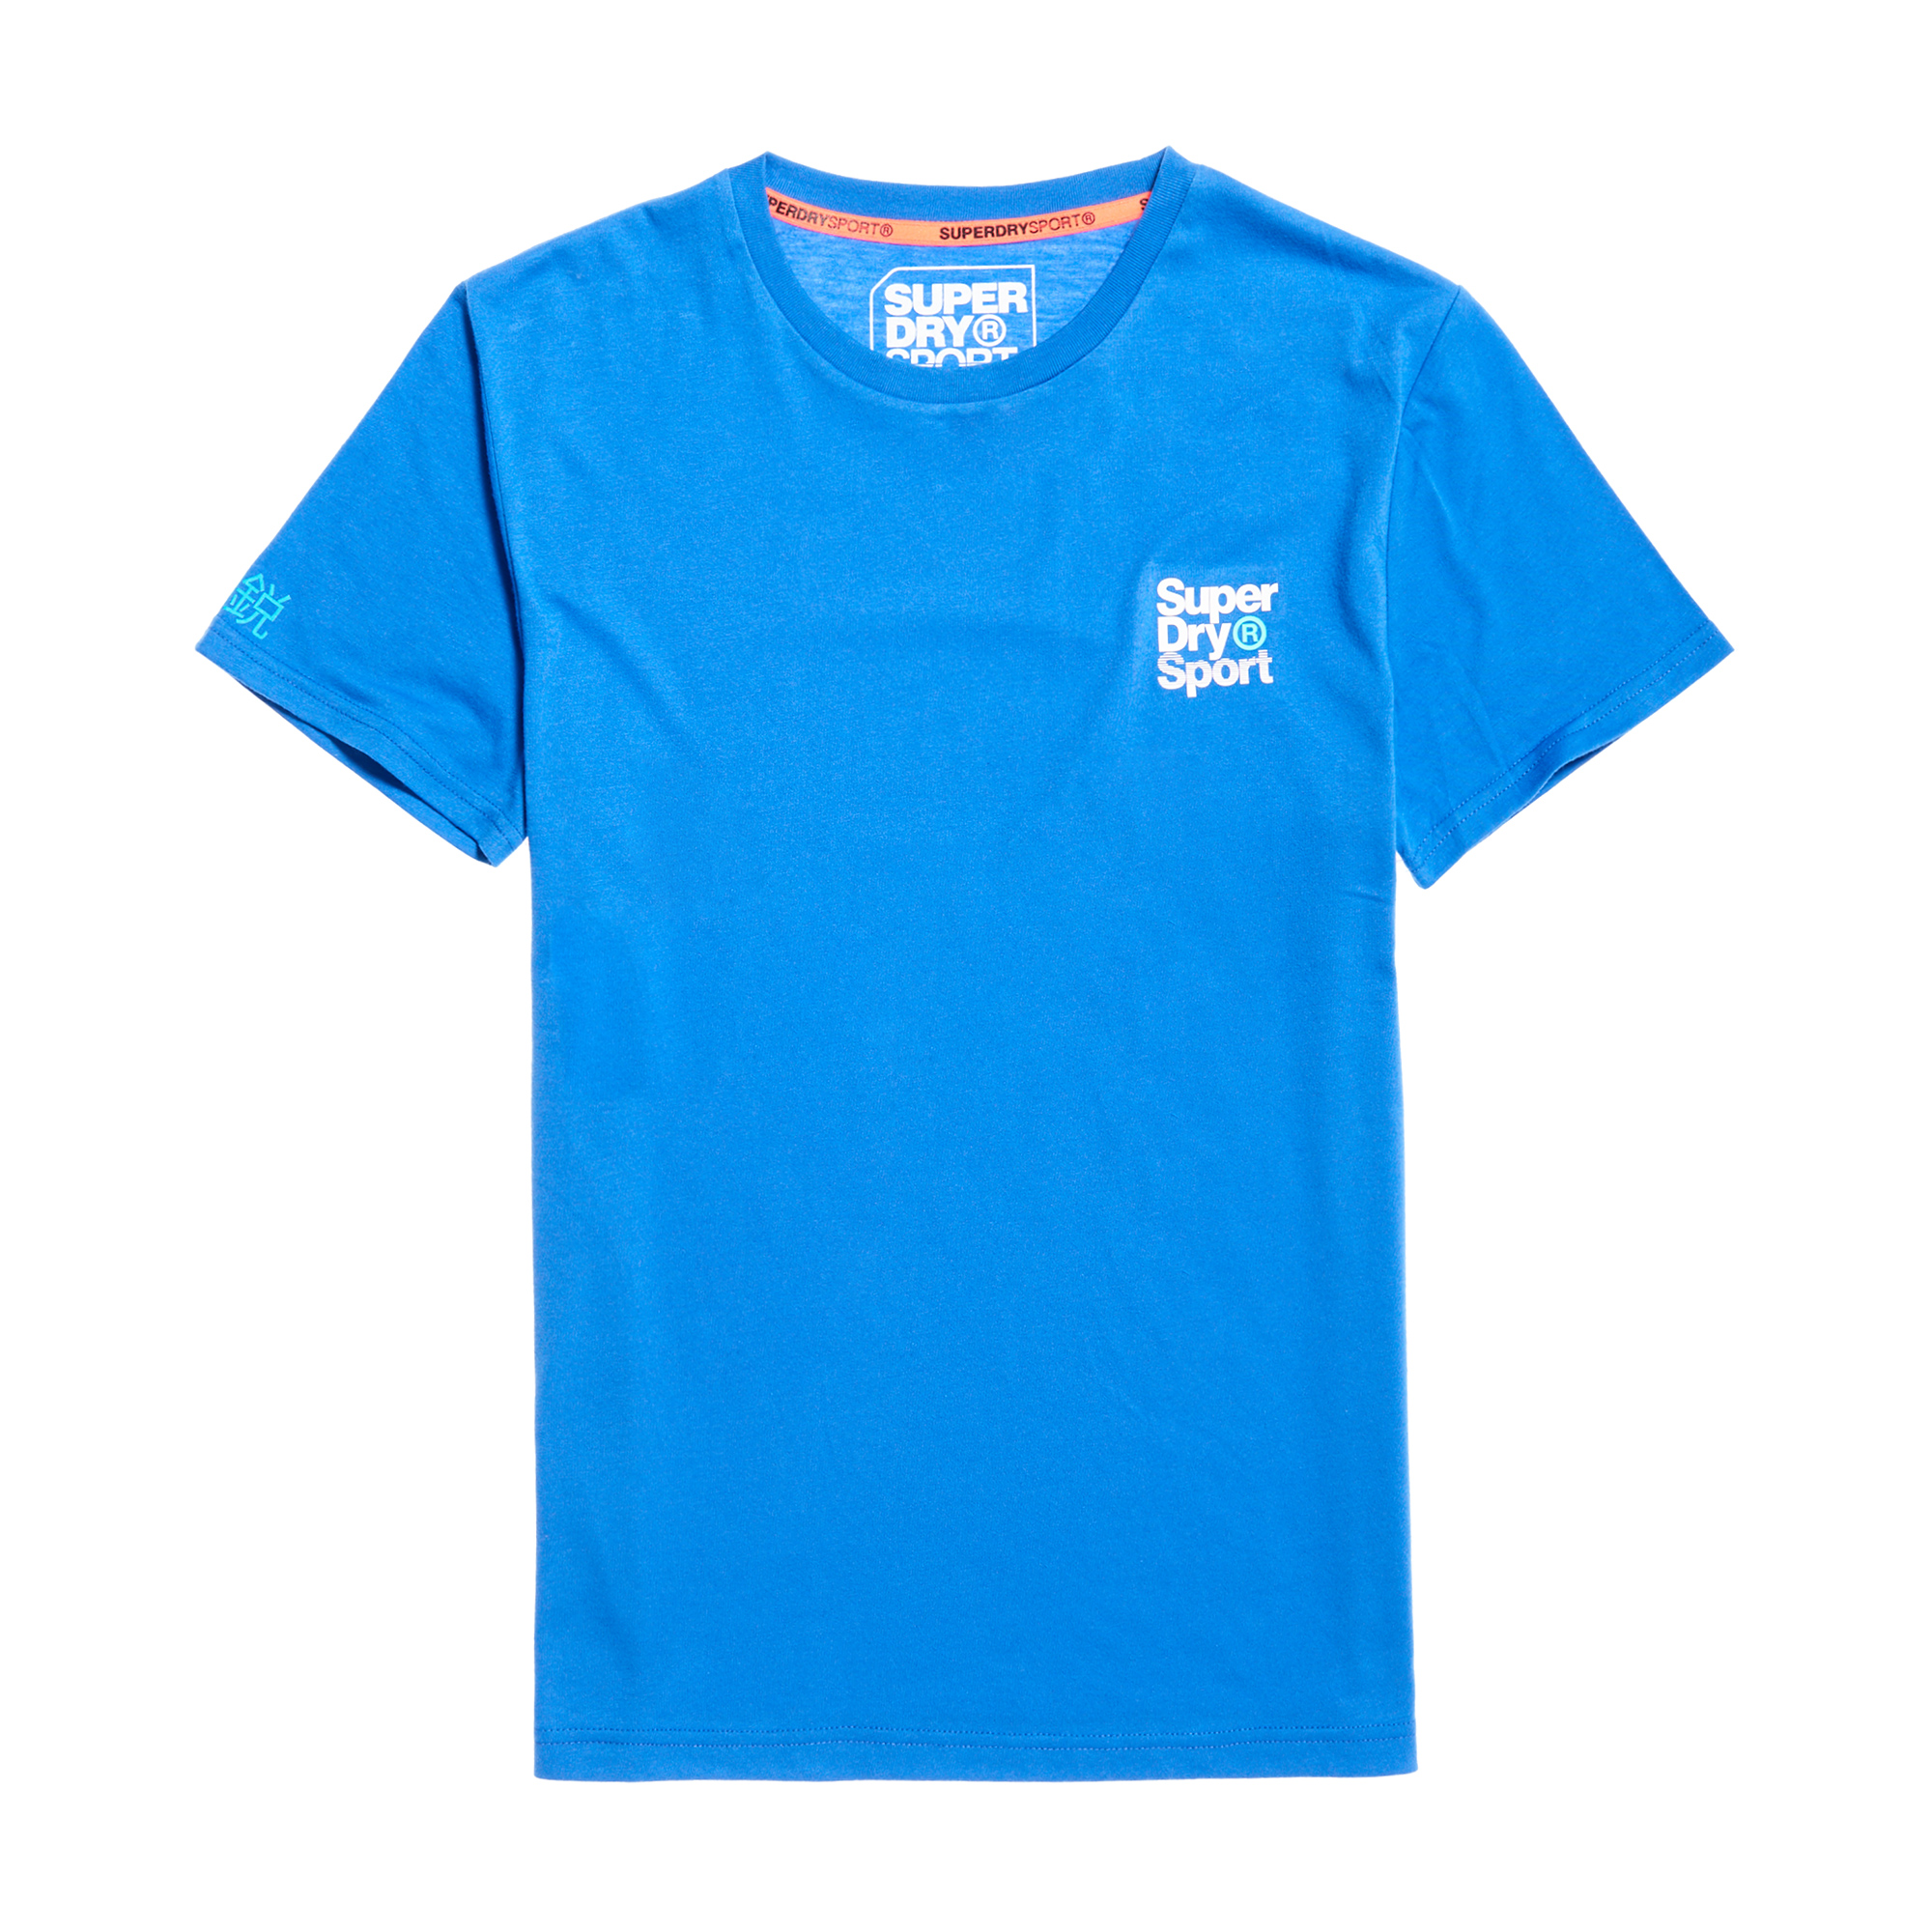 Core Sport Small Logo Tee, 70's Blue